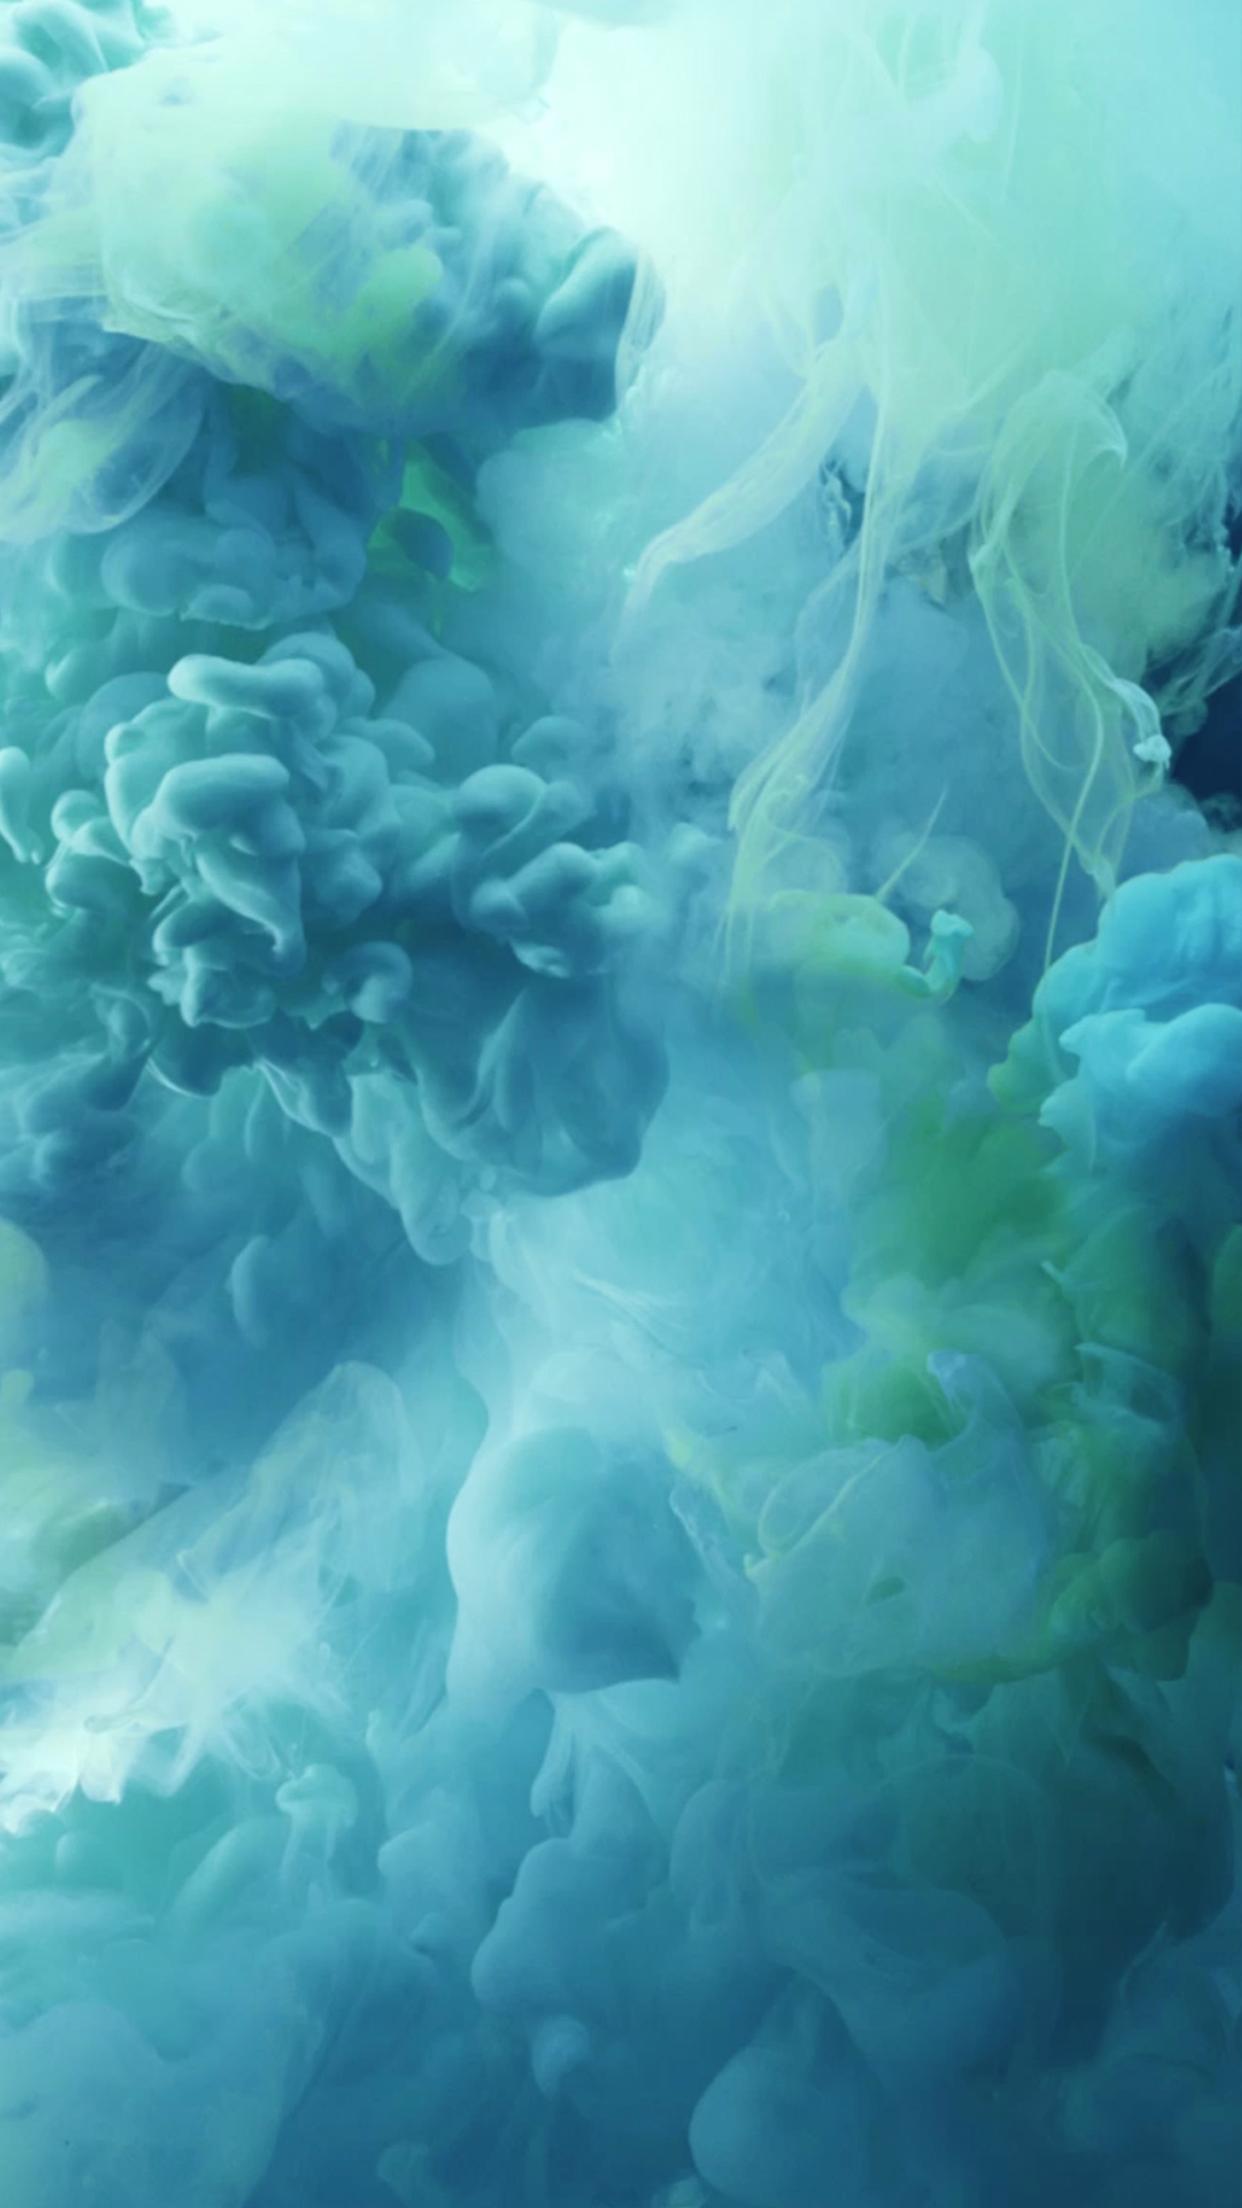 Download gli sfondi piu belli da iPhone 6s Wallpapers bellissimi 1242x2208